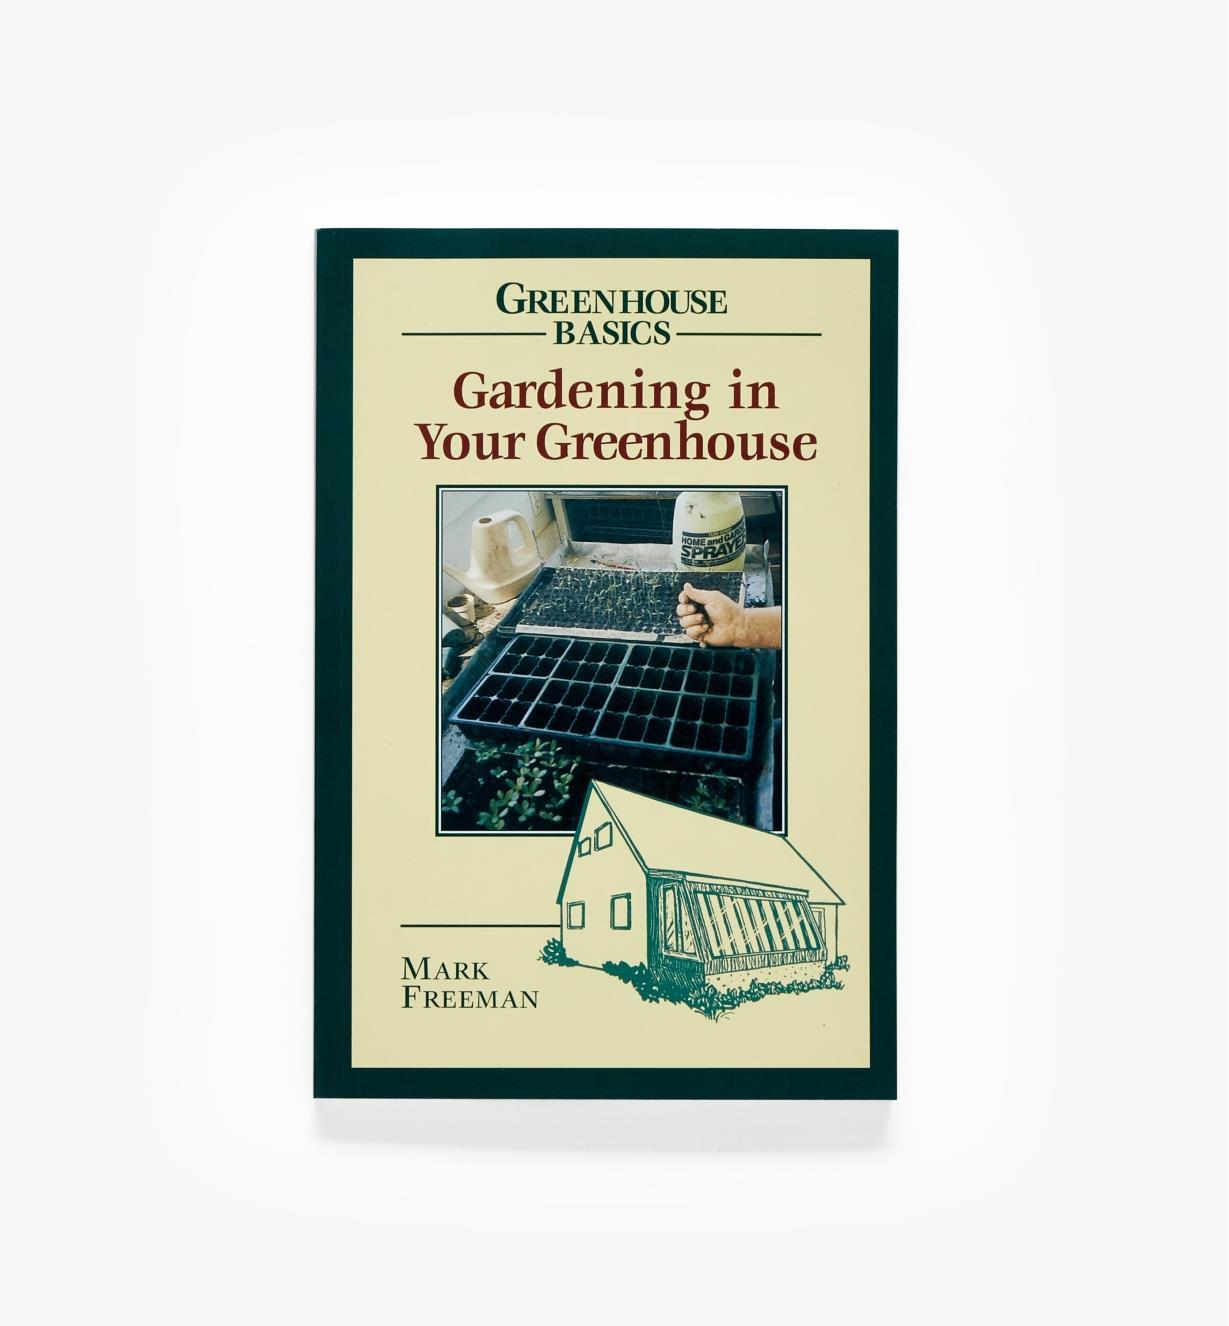 LA824 - Gardening in Your Greenhouse